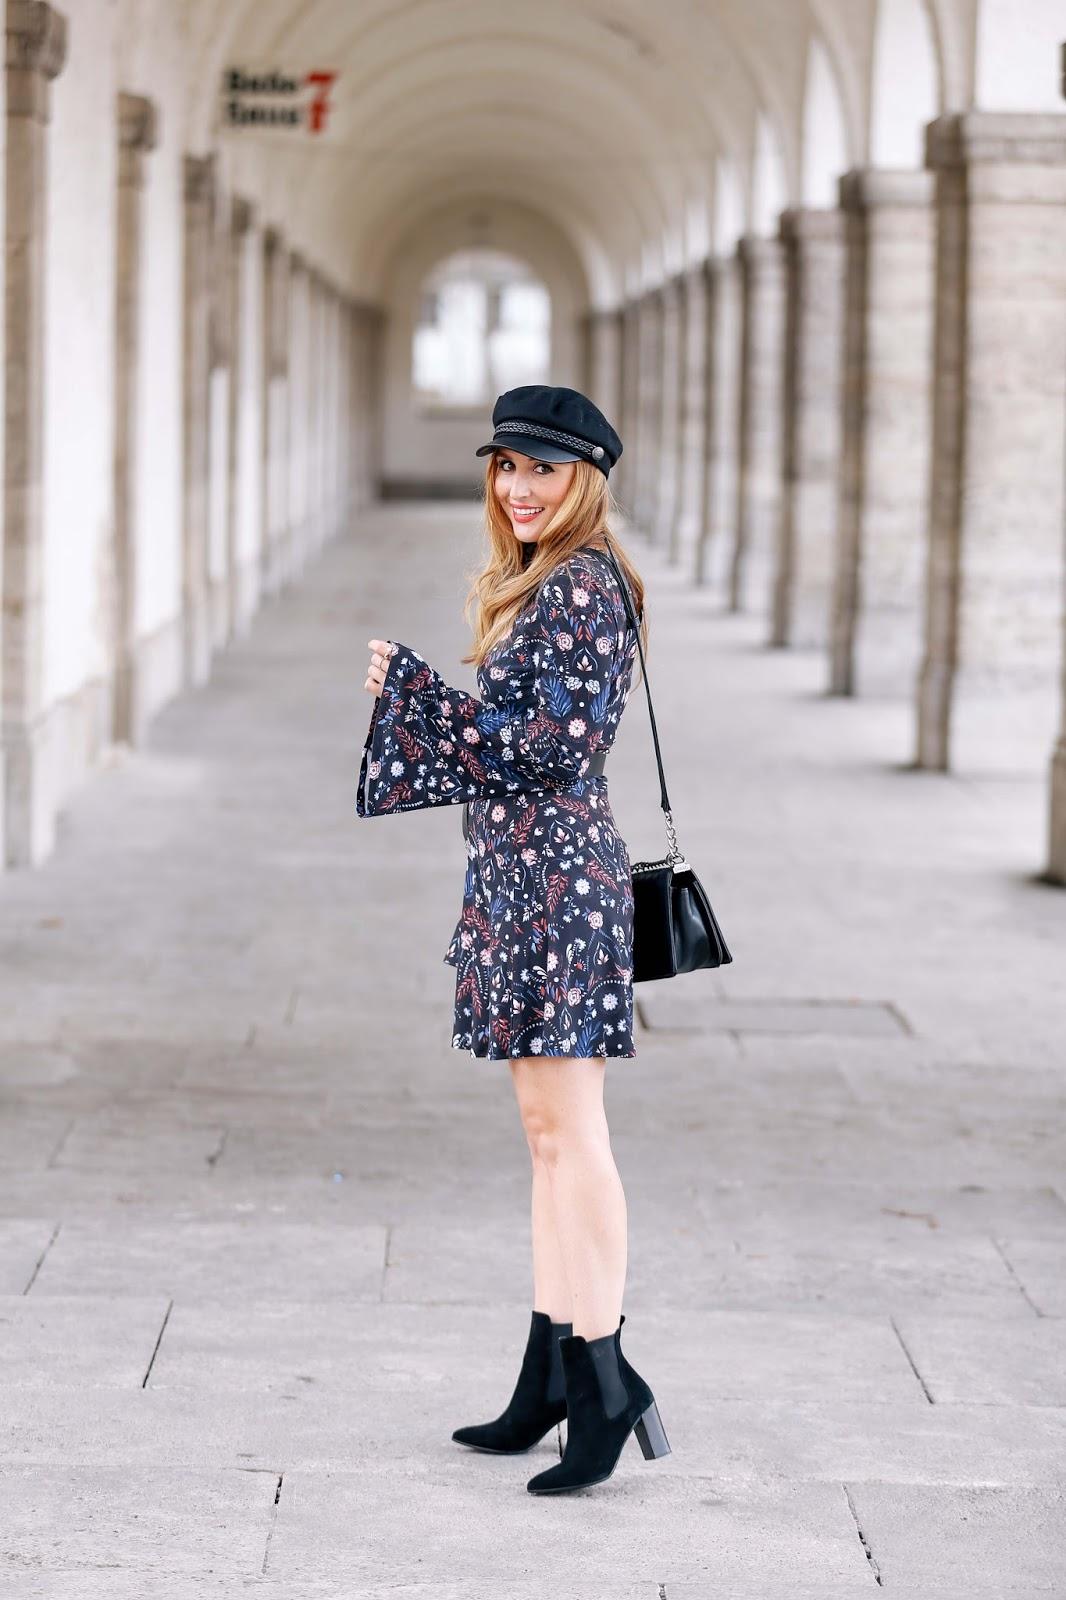 Chanel-boy-bag-blogger-fashionstylebyjohanna-Fashionstylebyjohanna-kenzas-ivyrevel-boots